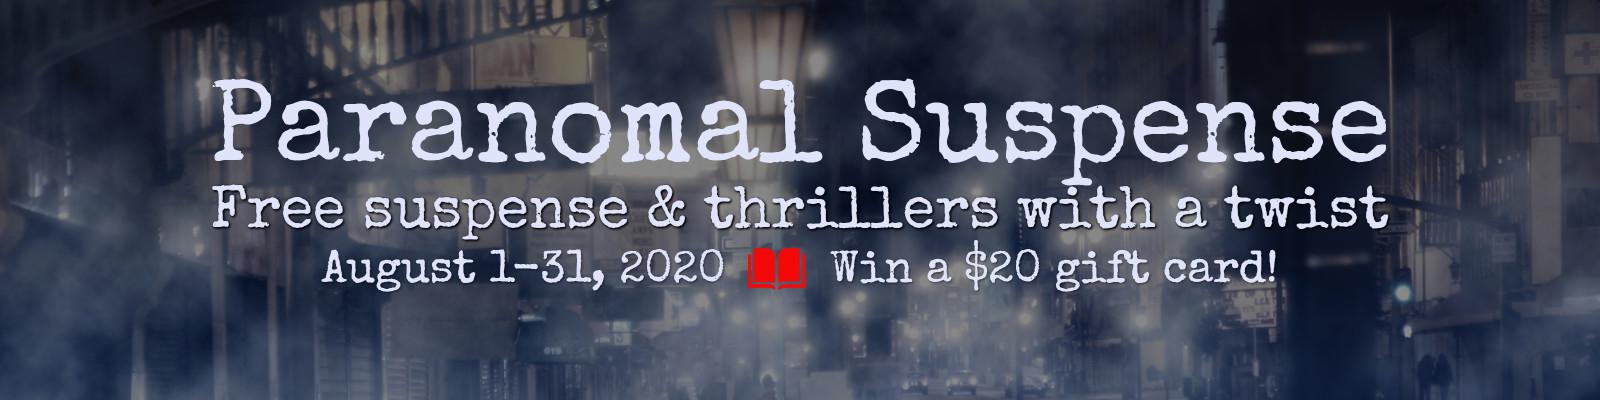 Paranormal Suspense banner